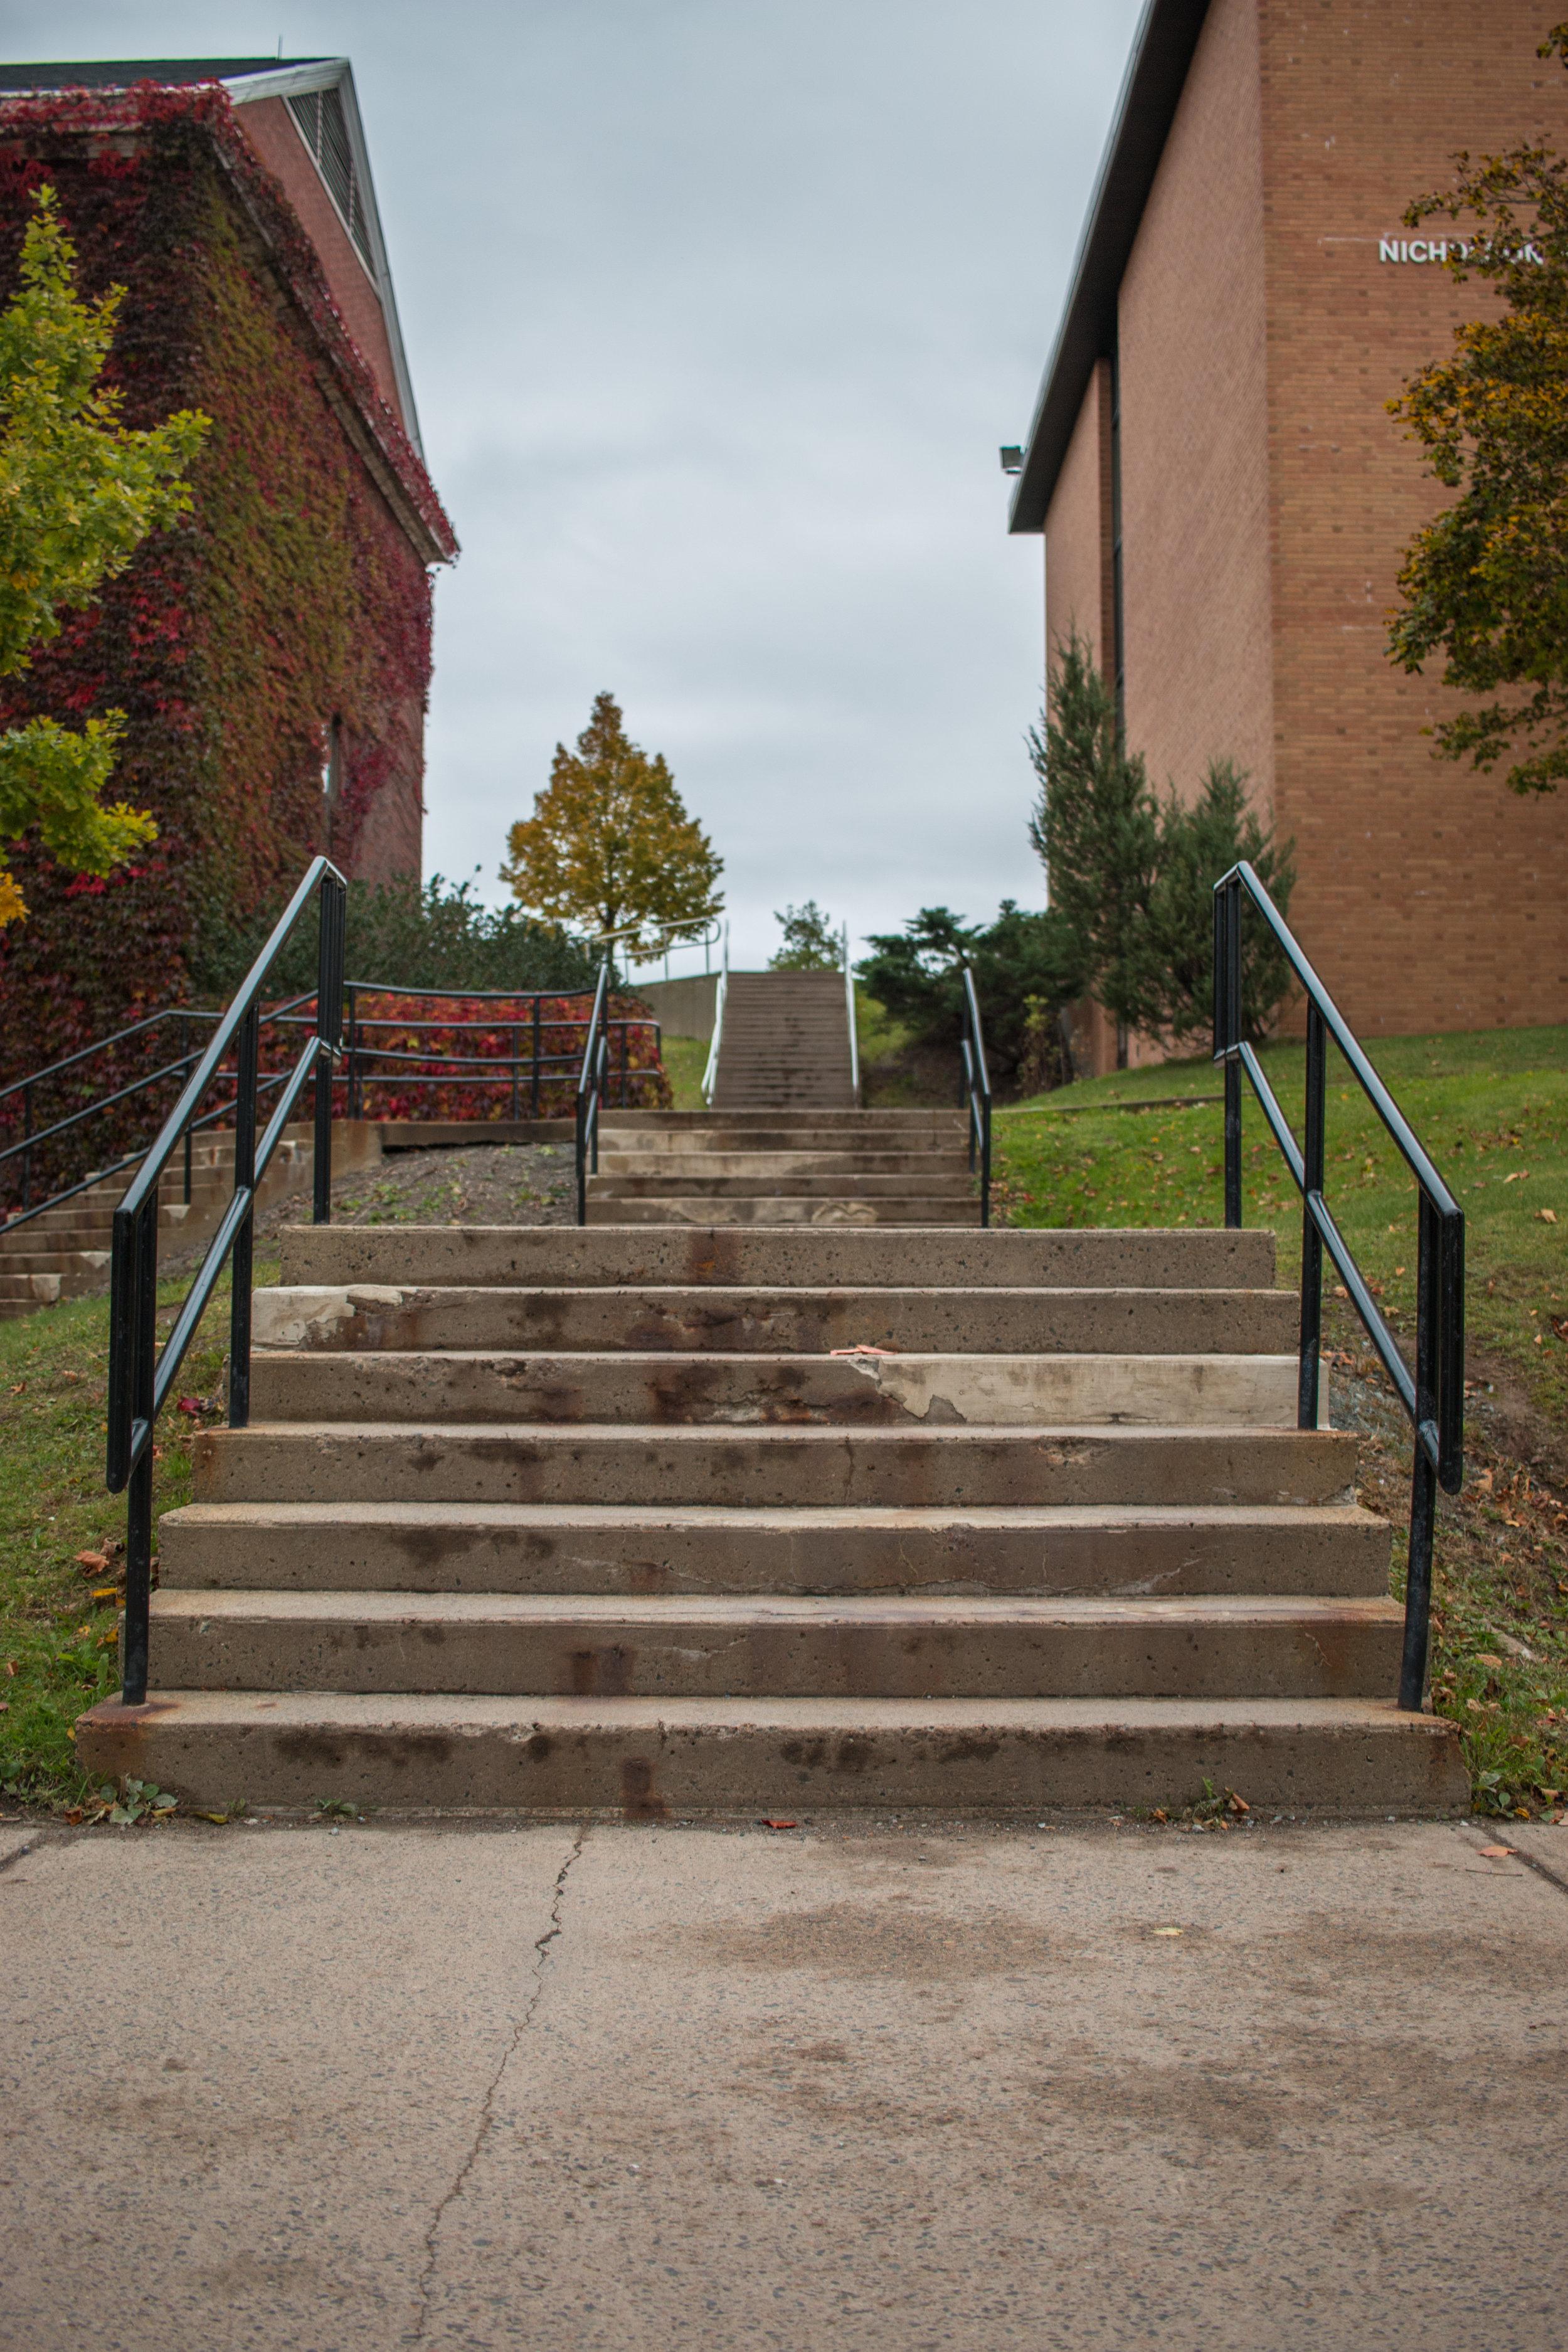 nicholson stairs separating upper and lower campus. photo: devon chisholm.